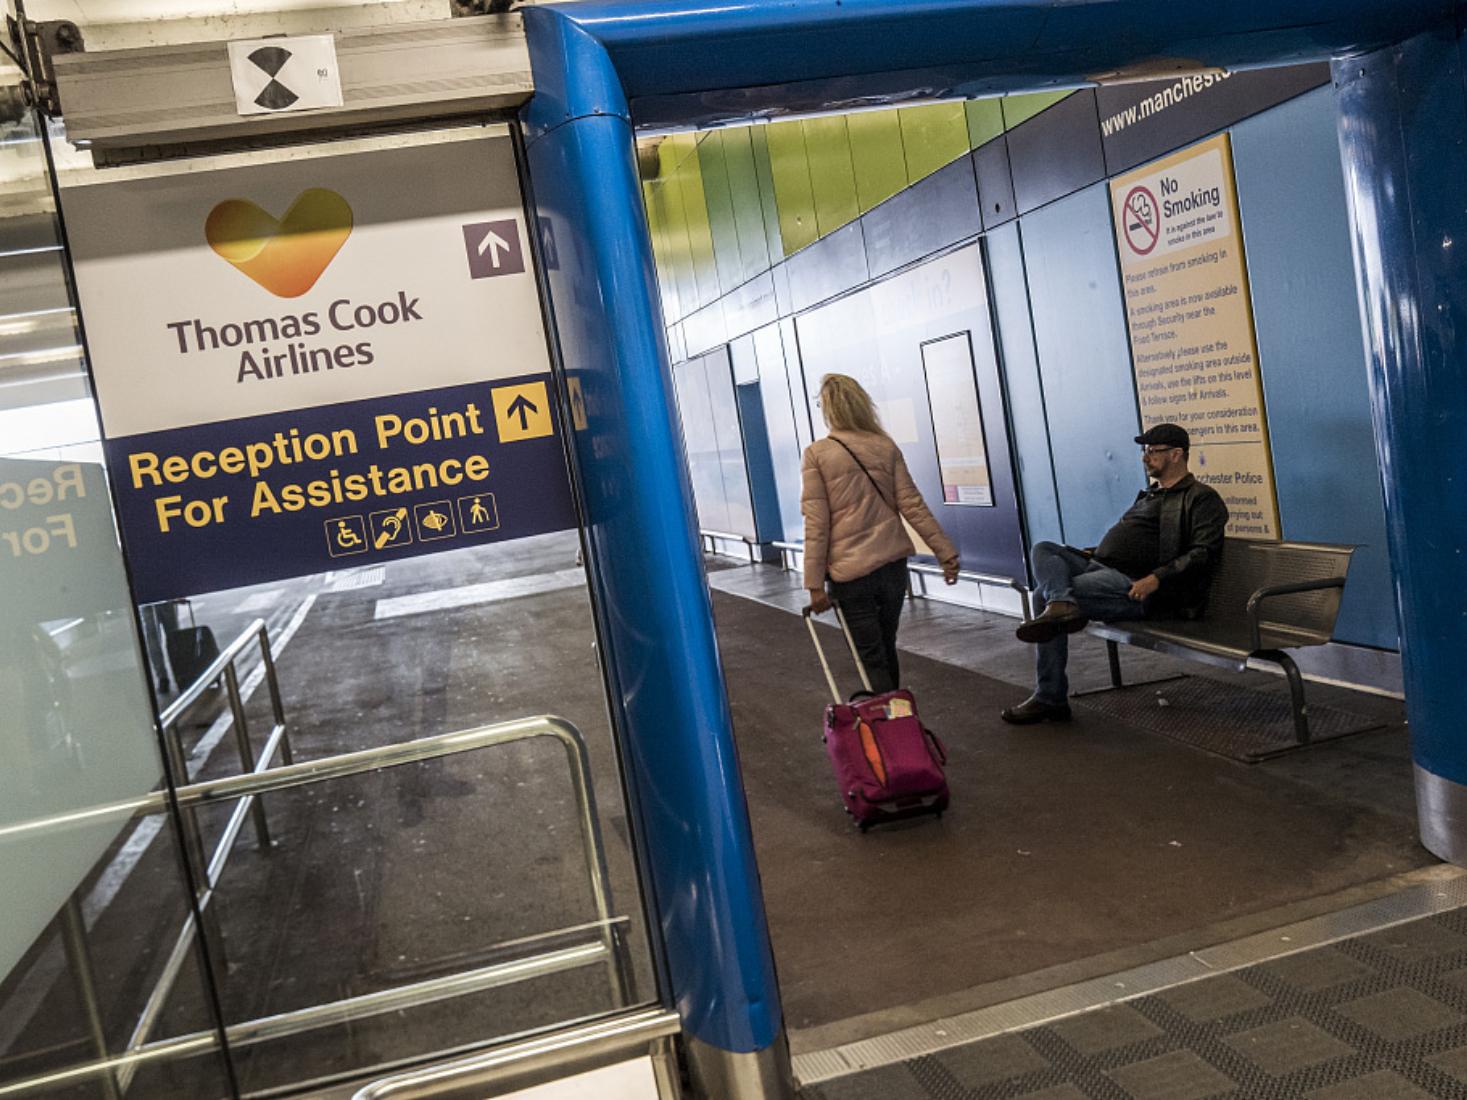 UK travel giant Thomas Cook collapses, stranding tourists